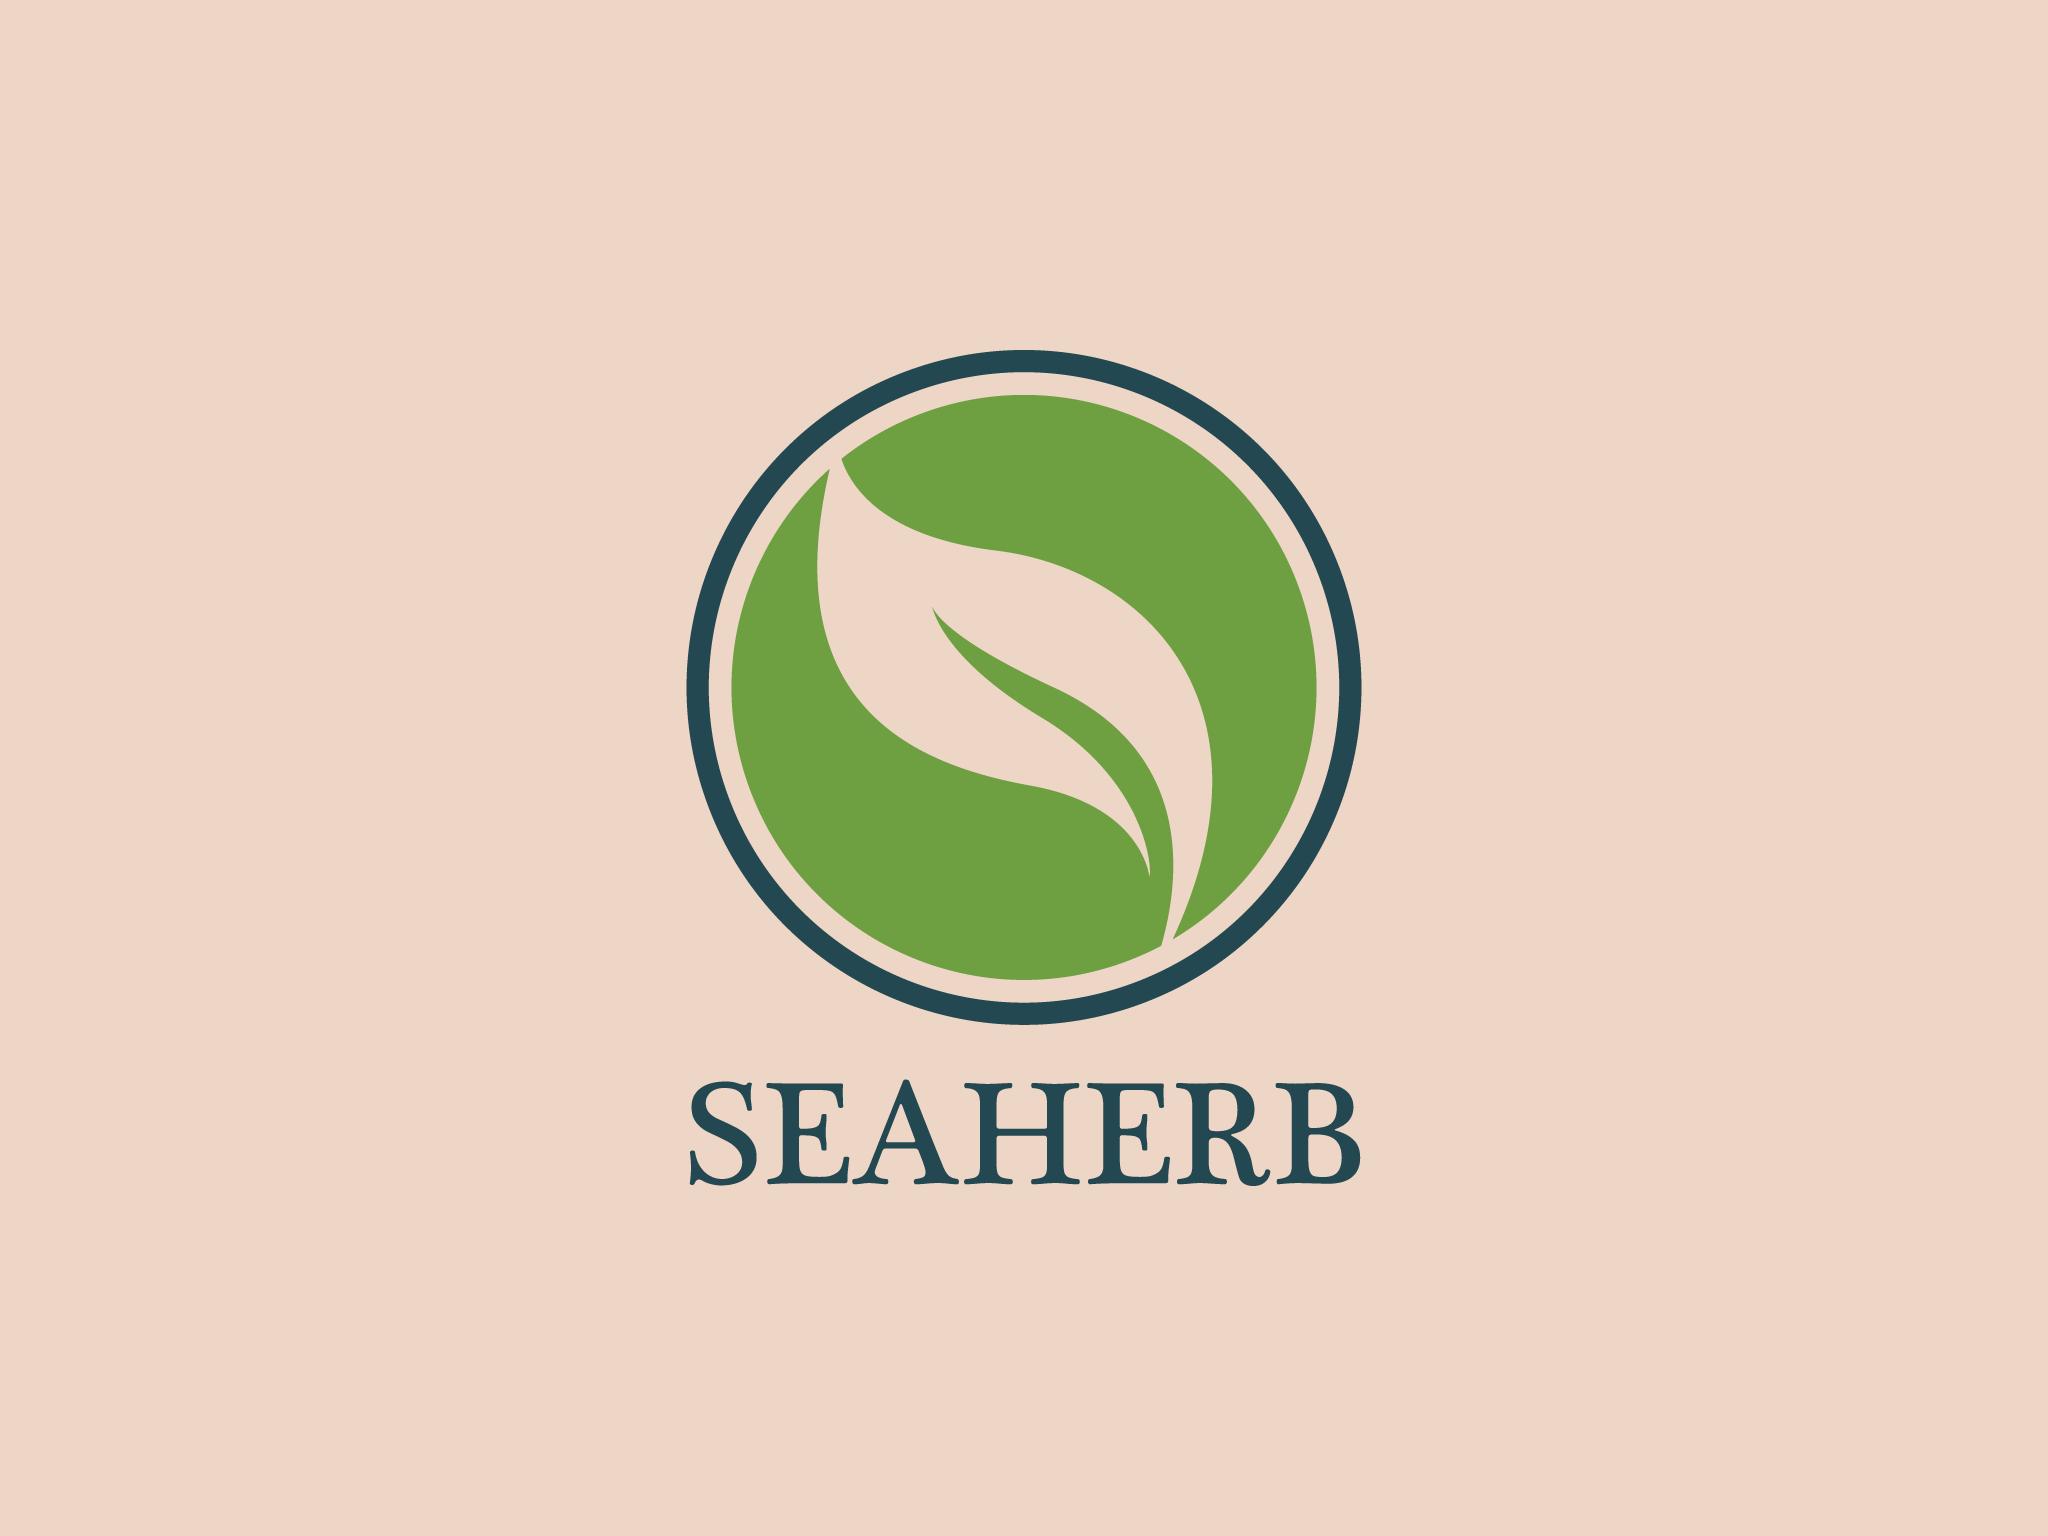 Logo Seaherb